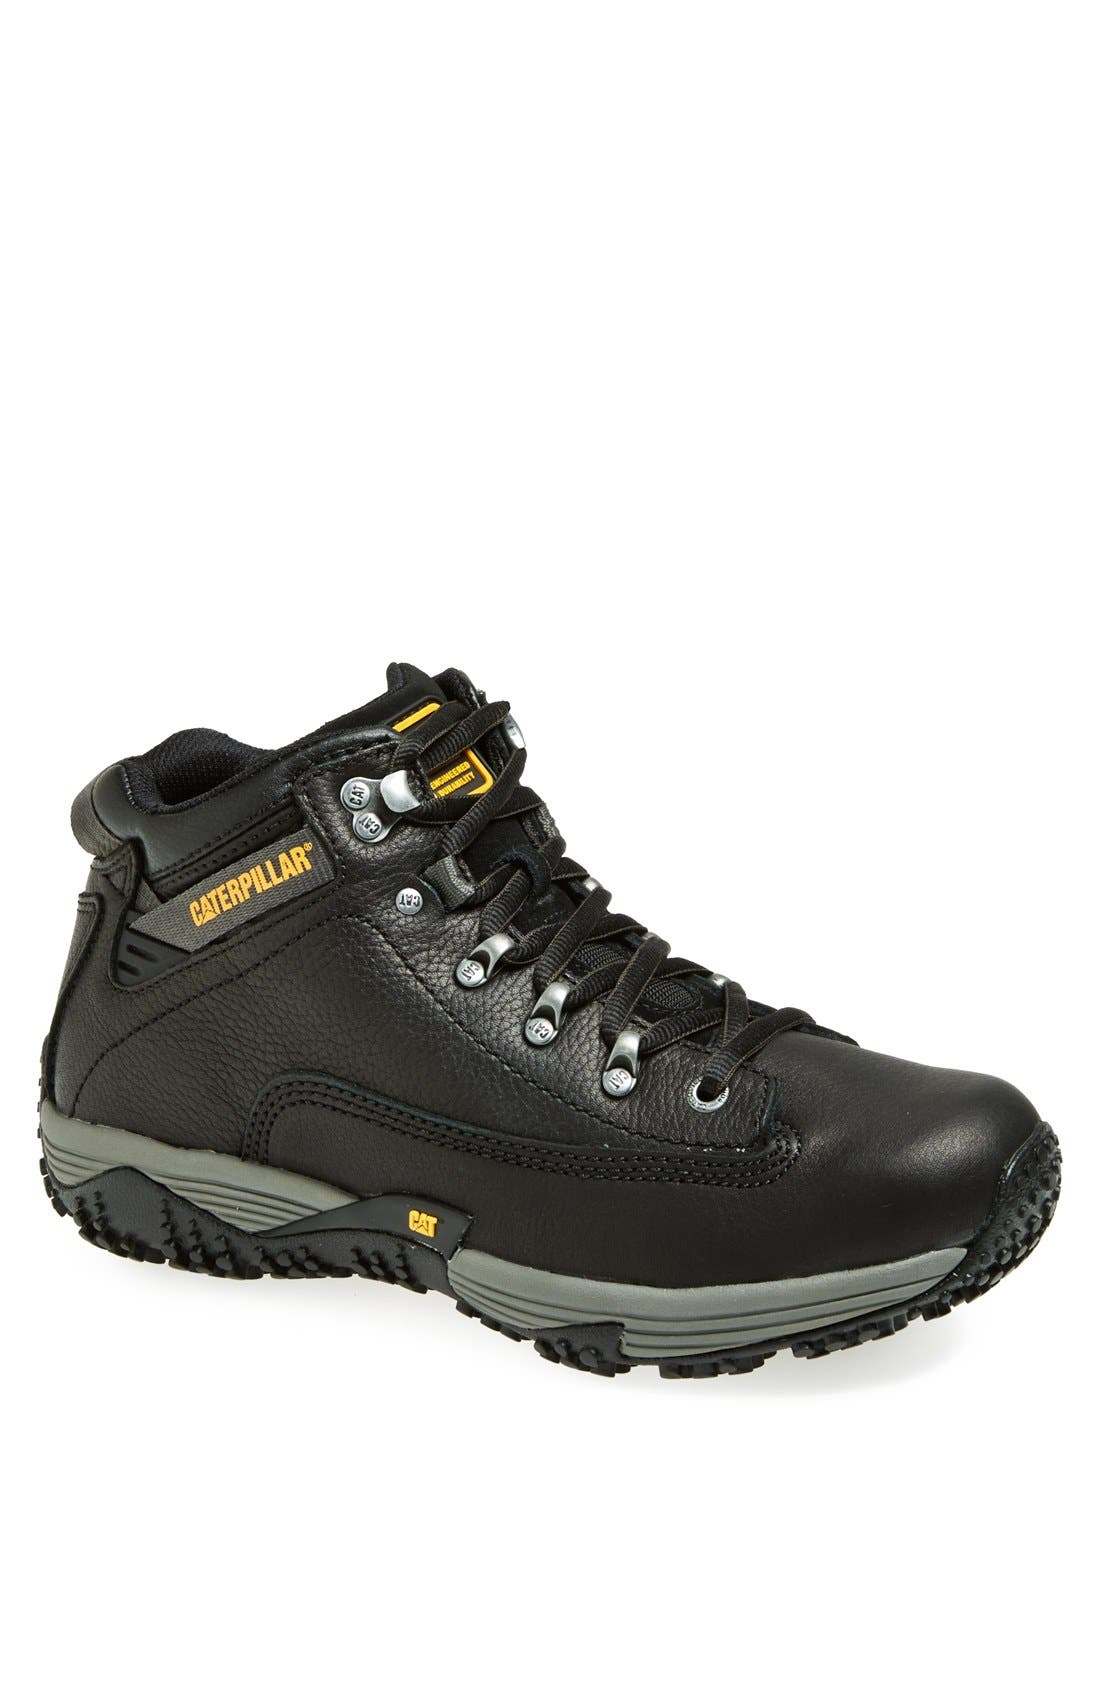 Alternate Image 1 Selected - Caterpillar 'Corax' Hiking Boot (Men)